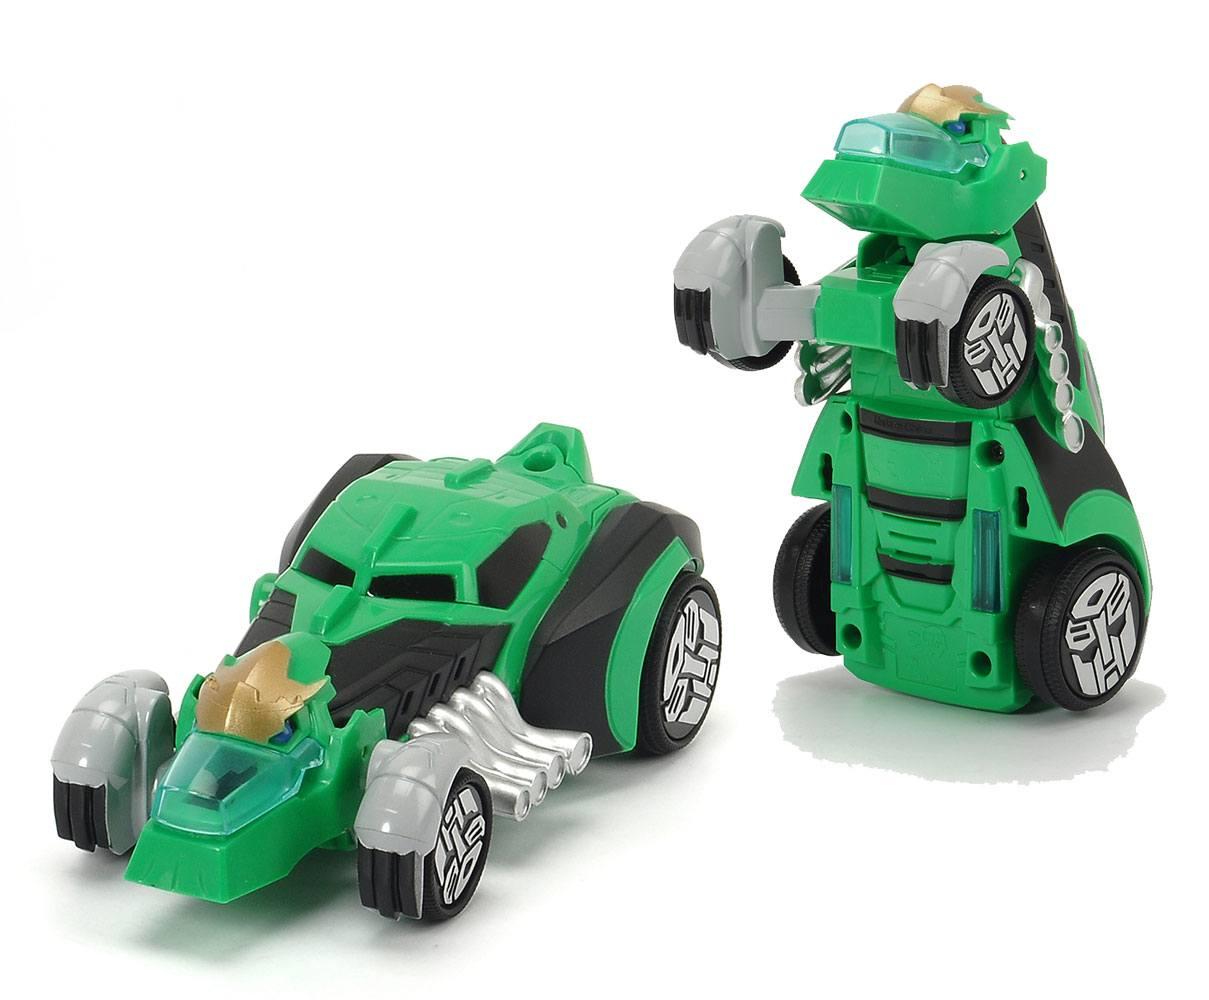 Transformers Robots in Disguise Robot Warrior Grimlock